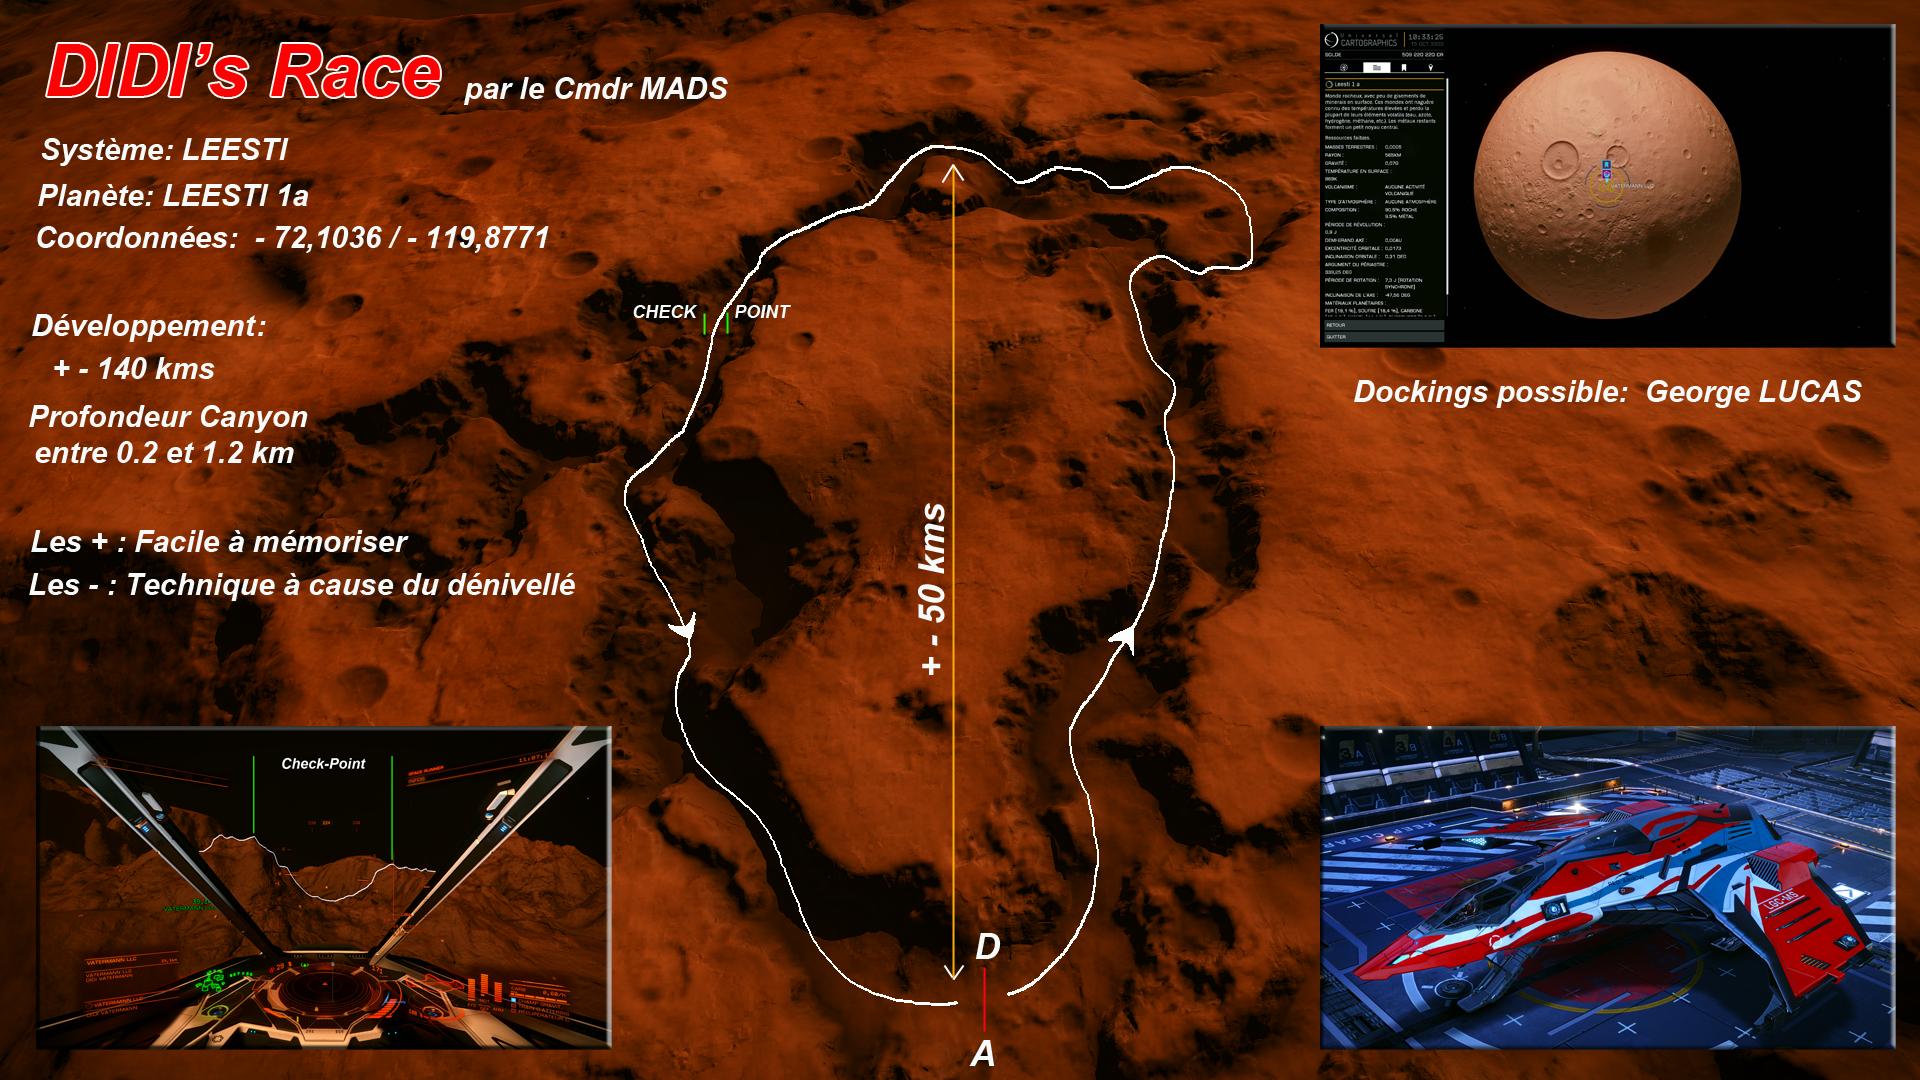 DIDI's Race